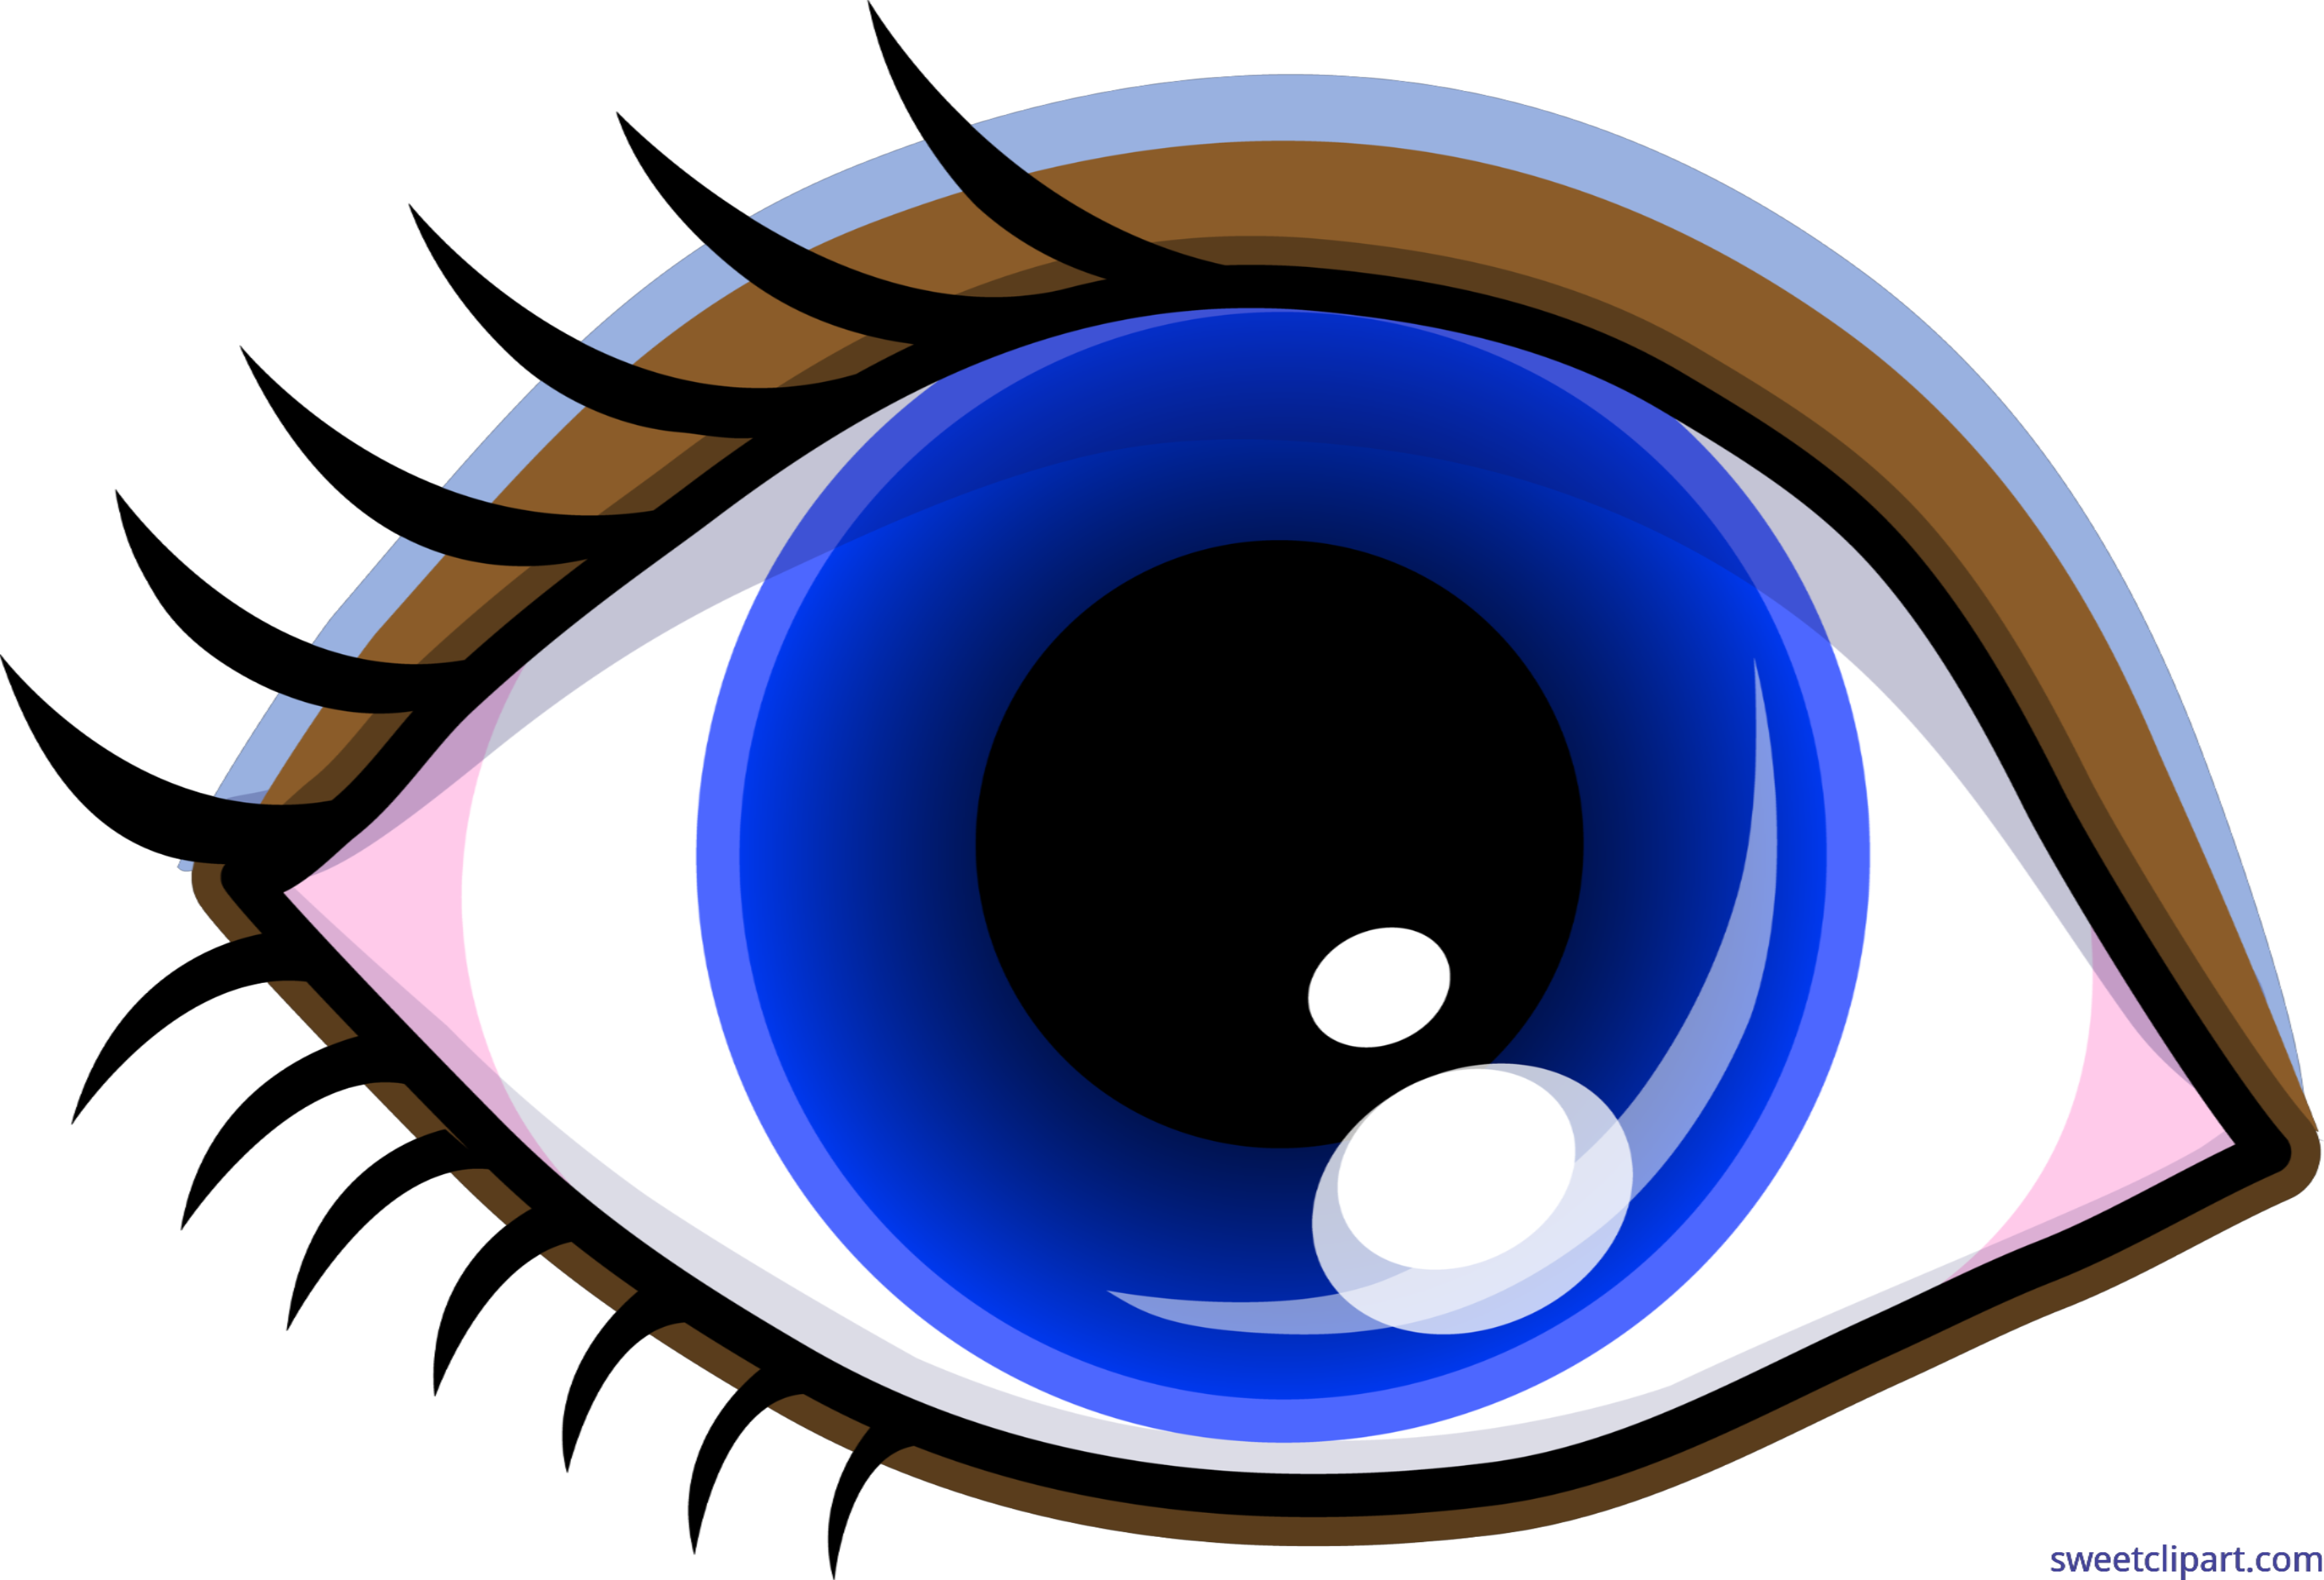 Symbol eye makeup blue. Eyelashes clipart tumblr transparent